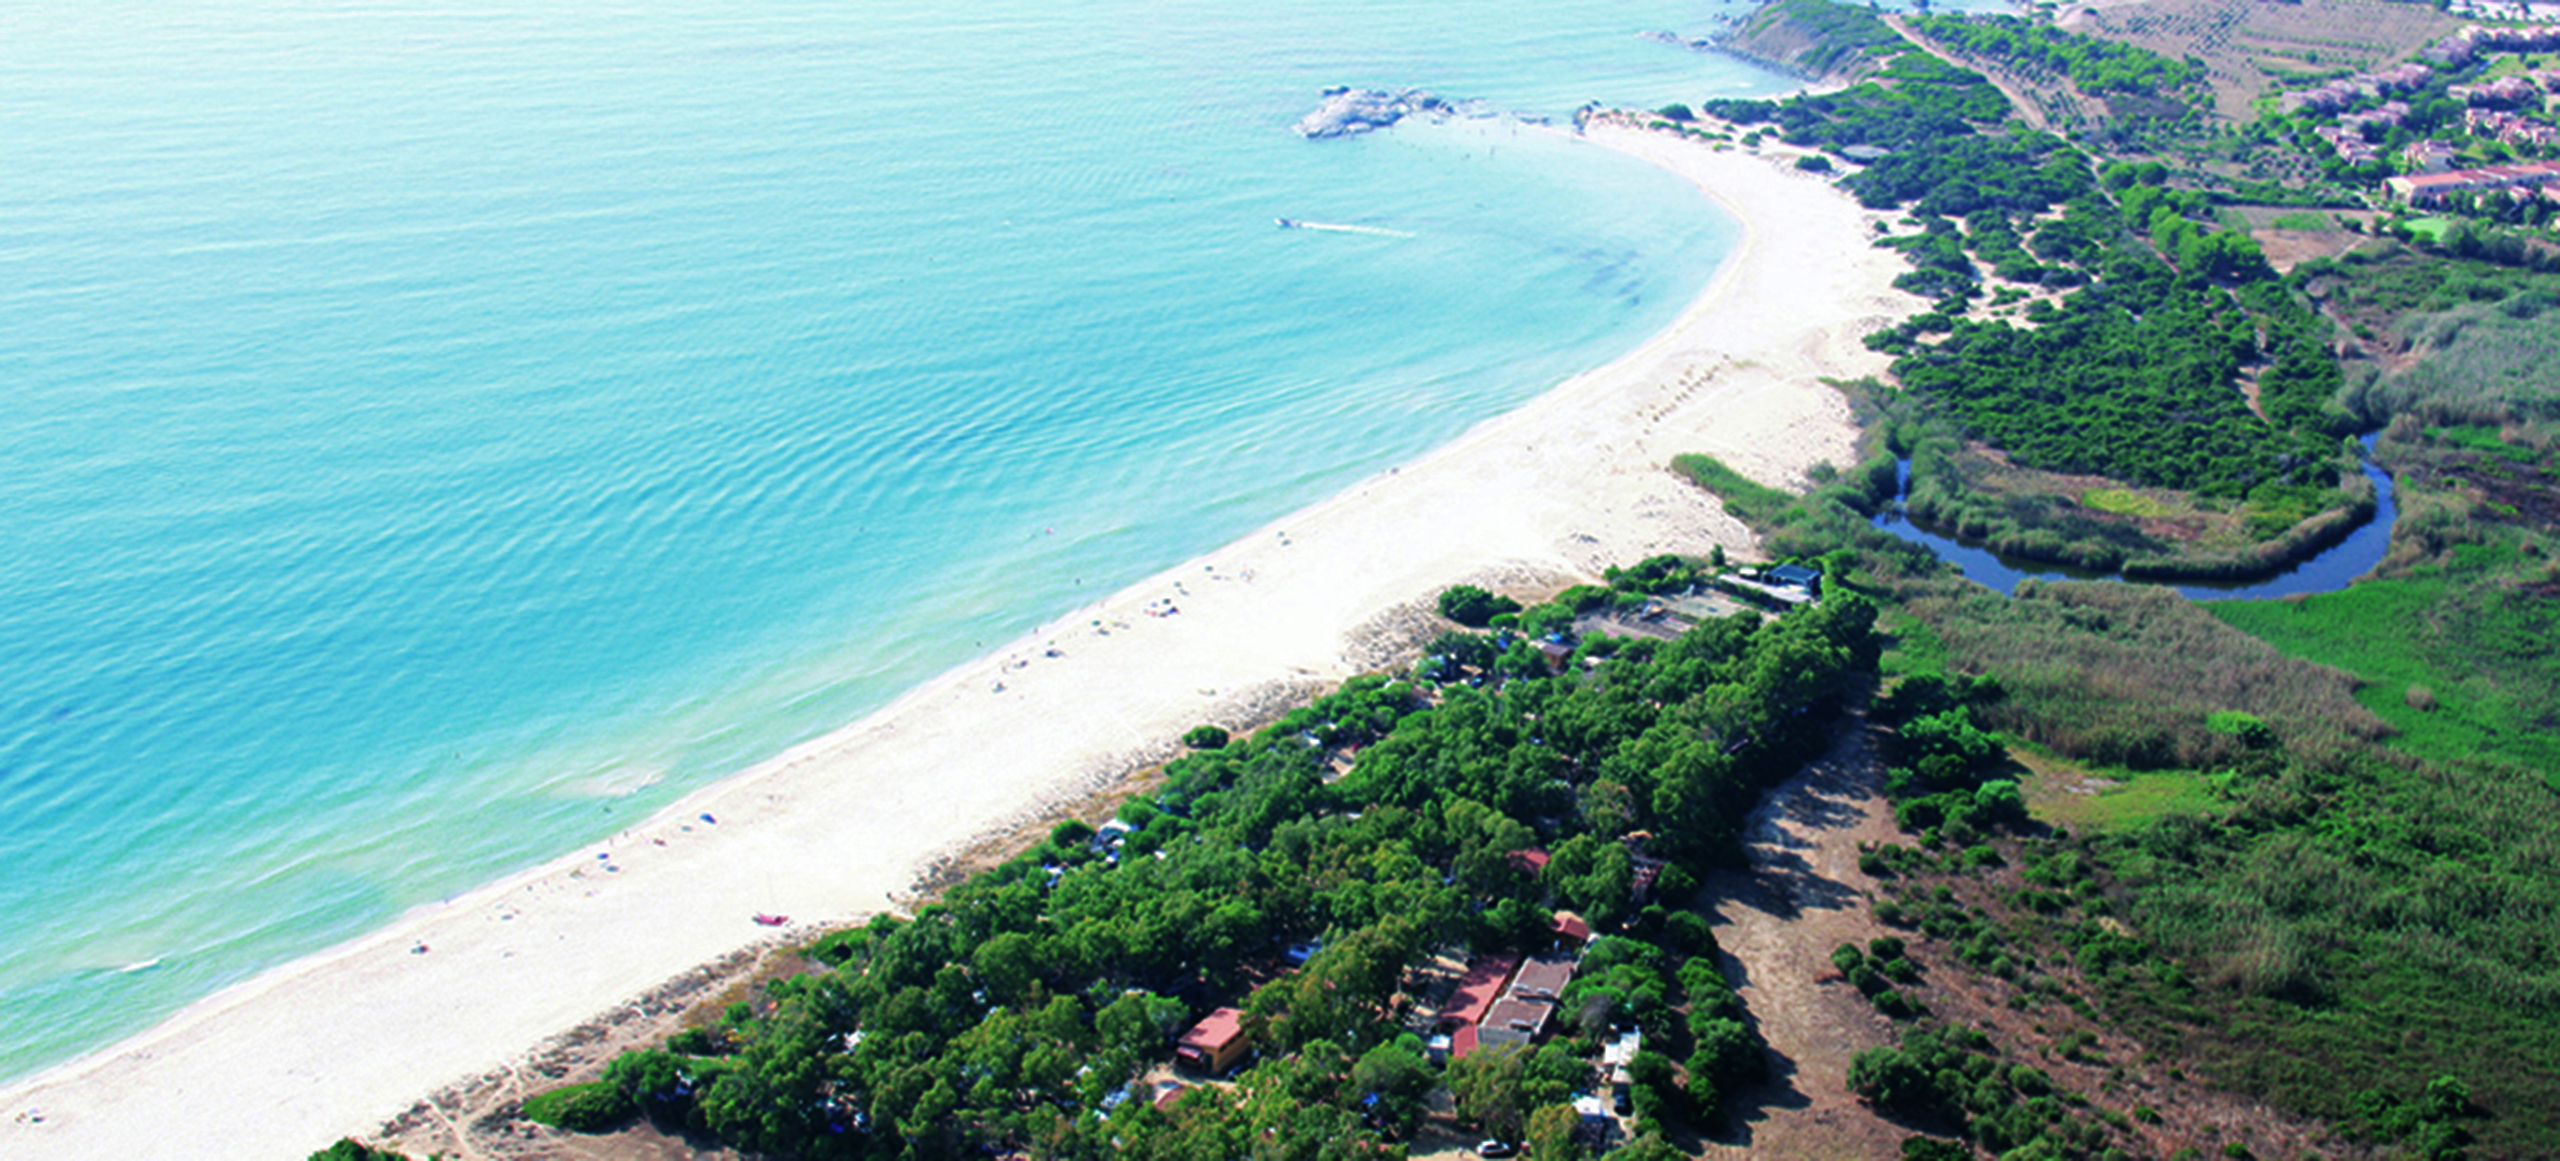 Camping Italien – die schönsten Campingplätze am Meer